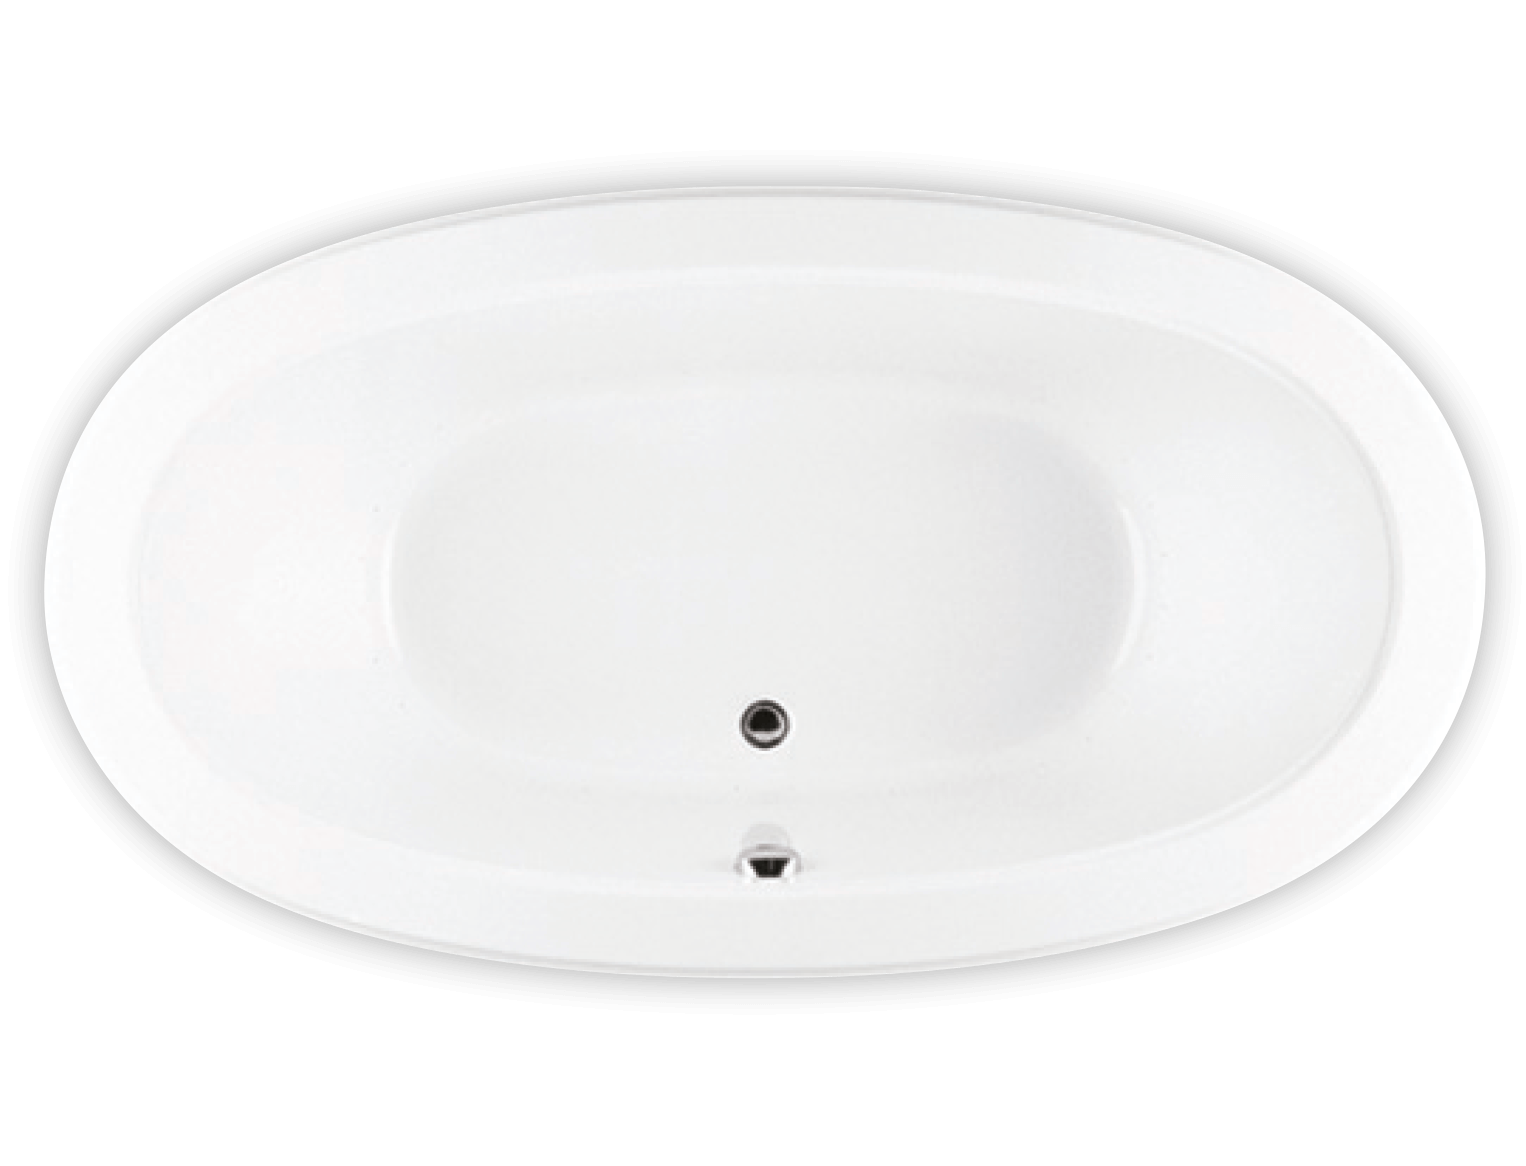 Bainultra Naos 7240 two person large pedestal air jet bathtub for your modern bathroom